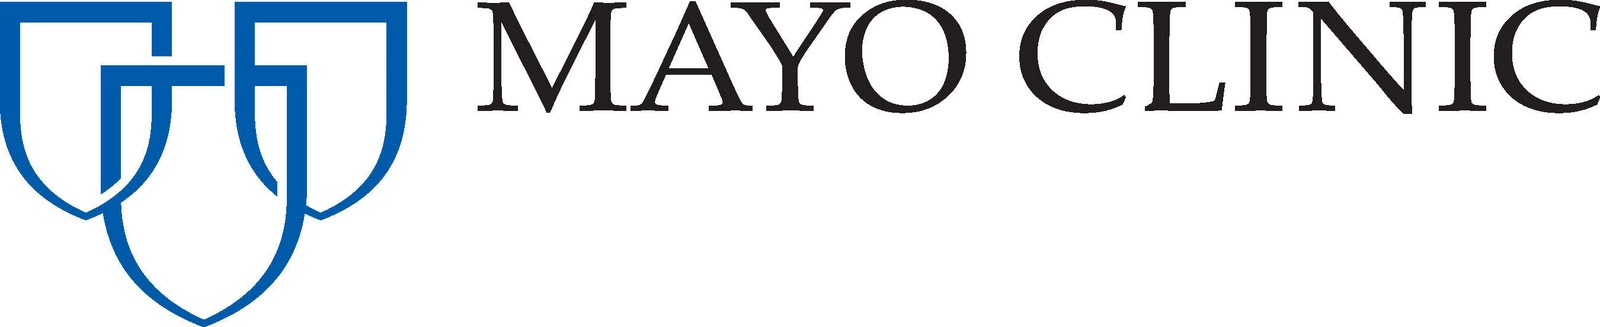 Mayo Clinic.  (PRNewsFoto/Mayo Clinic)